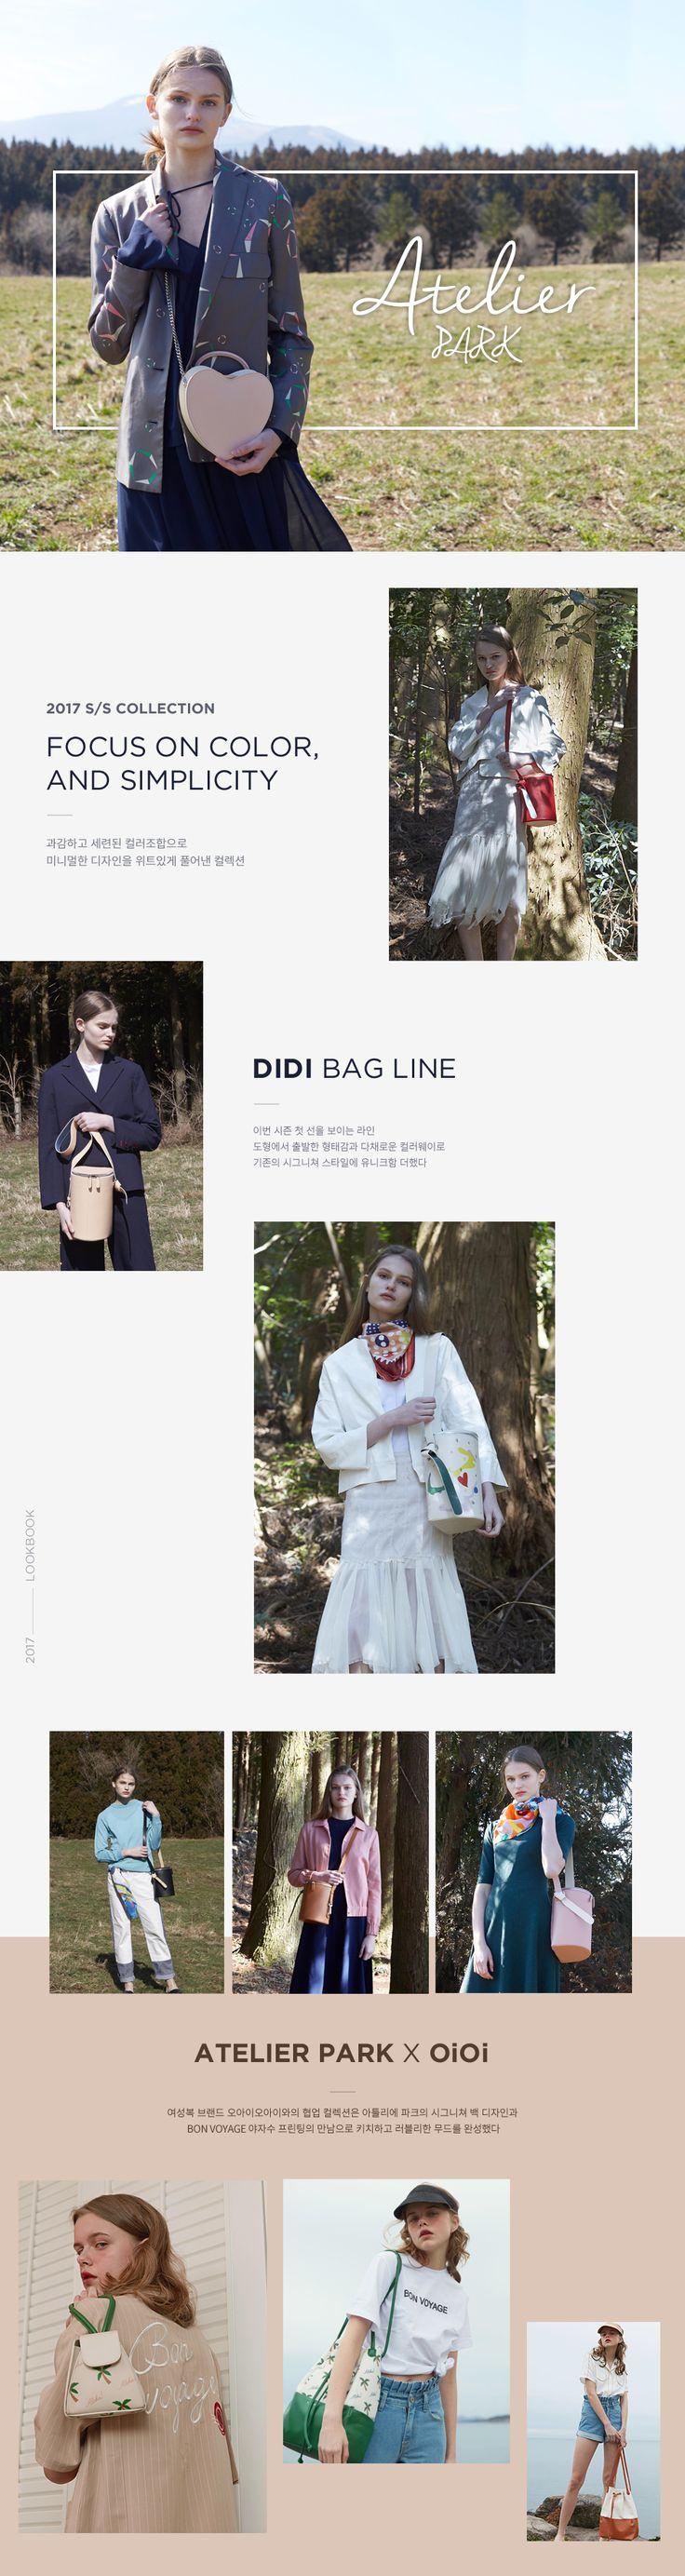 WIZWID:위즈위드 - 글로벌 쇼핑 네트워크 여성 가방 의류 우먼 패션 백 기획전 ATELIER PARK S/S COLLECTION 과감하고 세련된 컬러웨이가 돋보이는 17S/S 컬렉션 오픈